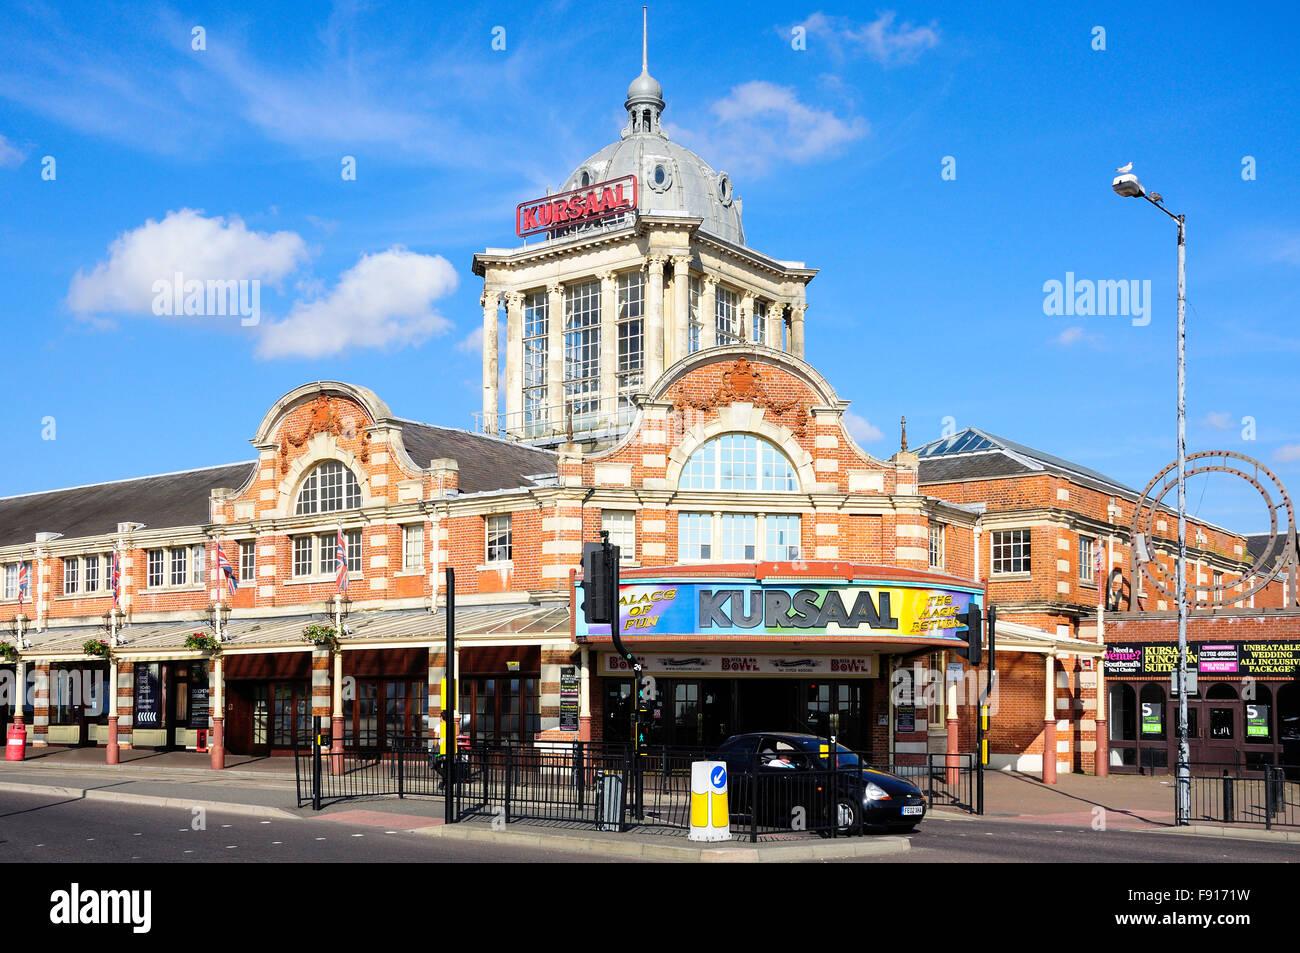 The Kursaal amusement park, Marine Parade, Southend-On-Sea, Essex, England, United Kingdom - Stock Image